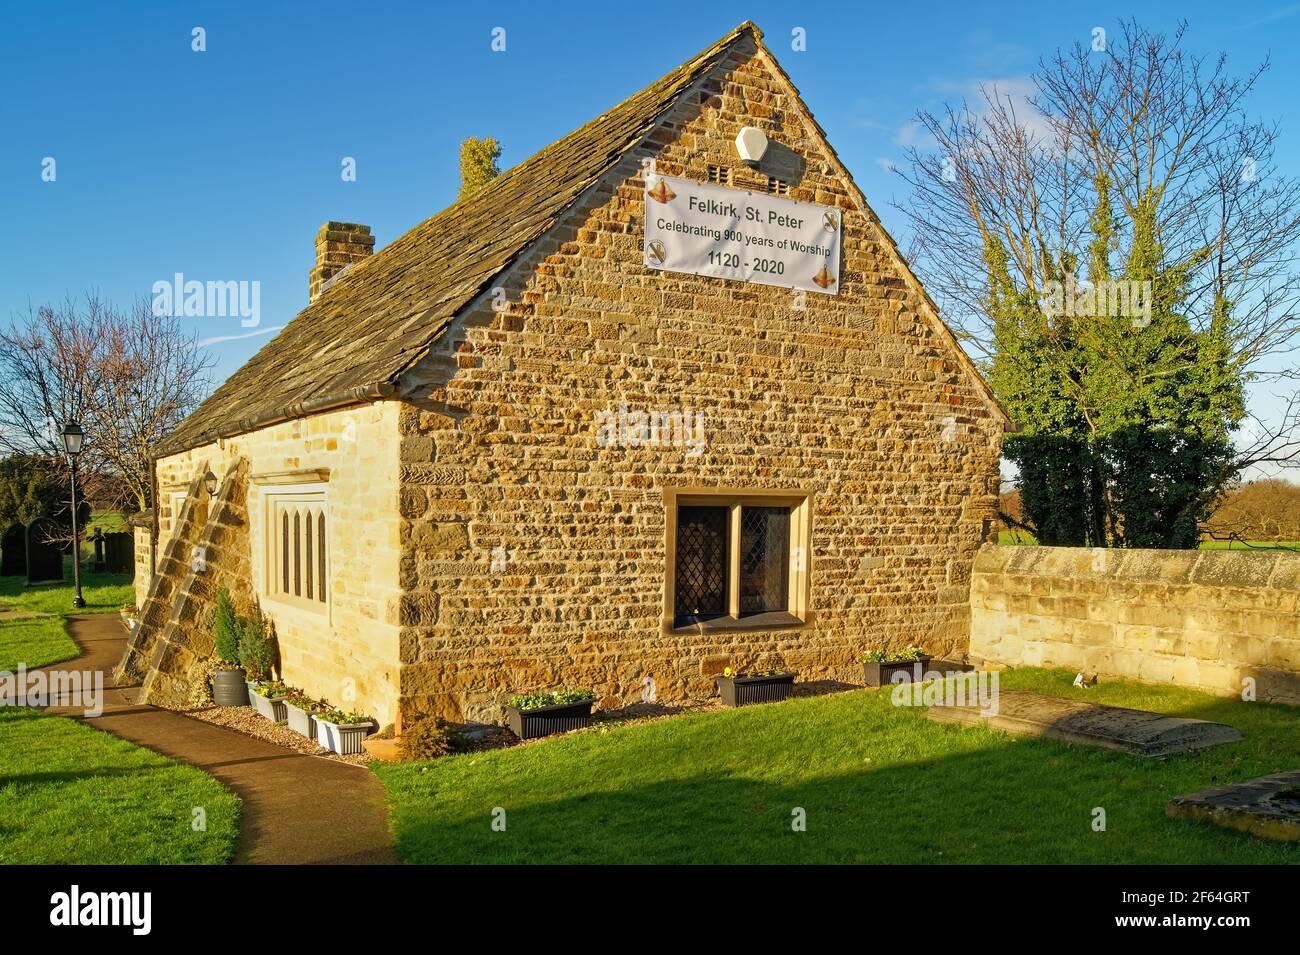 UK, West Yorkshire, Wakefield, Felkirk, St Peter's Church, Old School Room Stock Photo